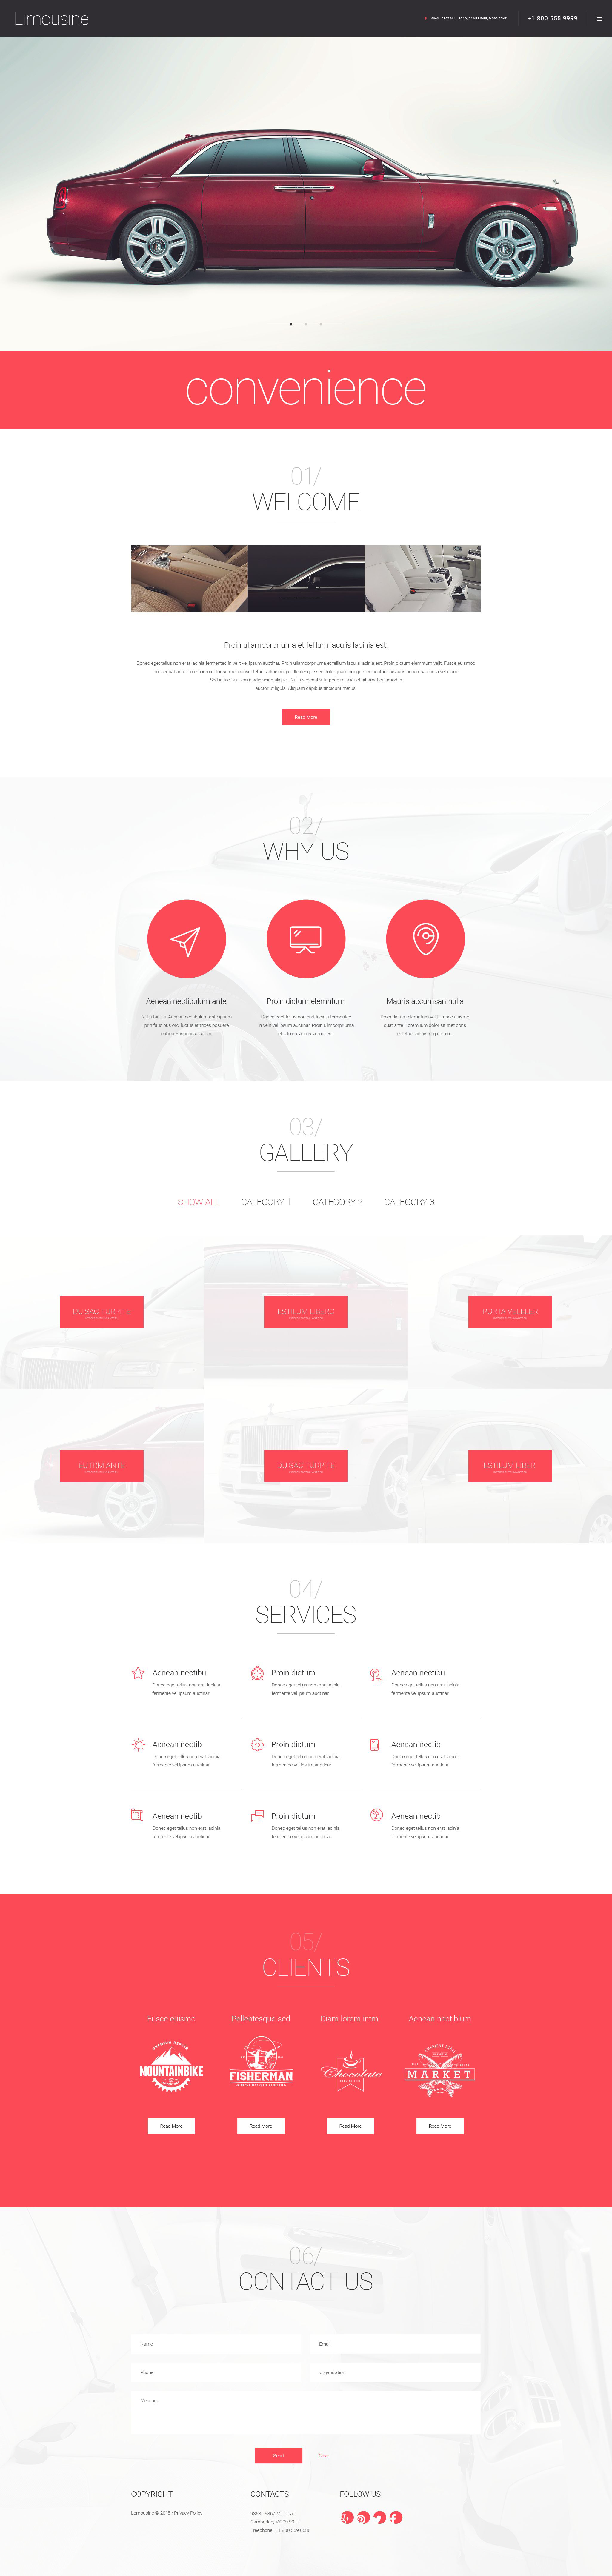 "Modello WordPress Responsive #55049 ""Commercianti d'Auto"" - screenshot"